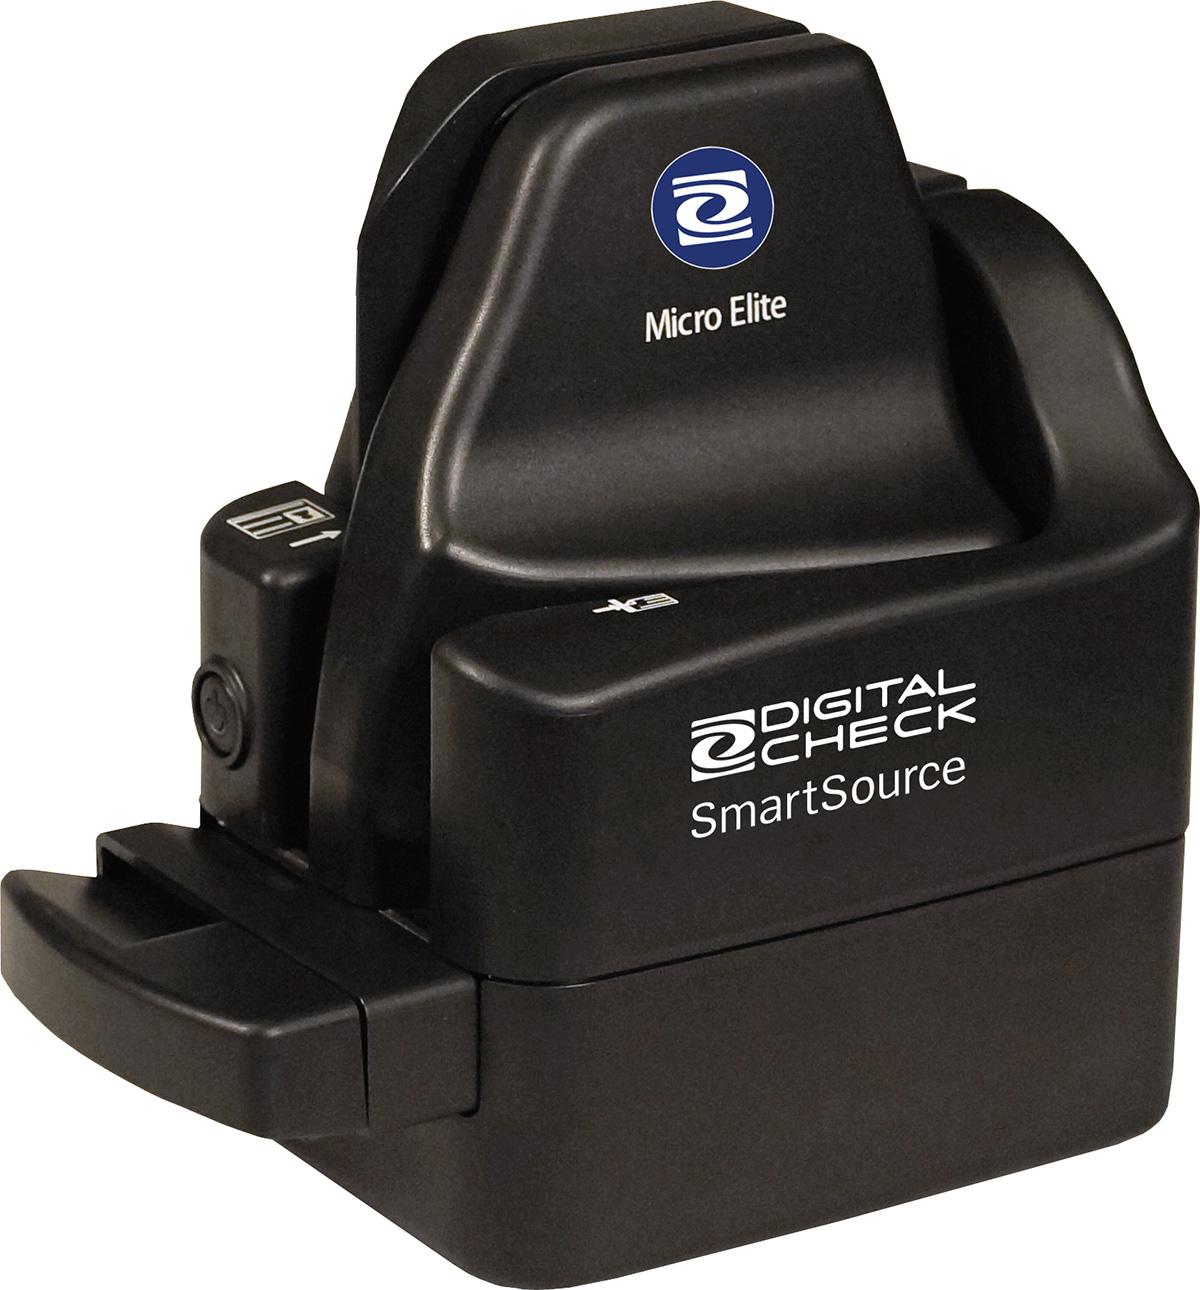 RDC Scanner - SmartSource® Micro Elite - Digital Check